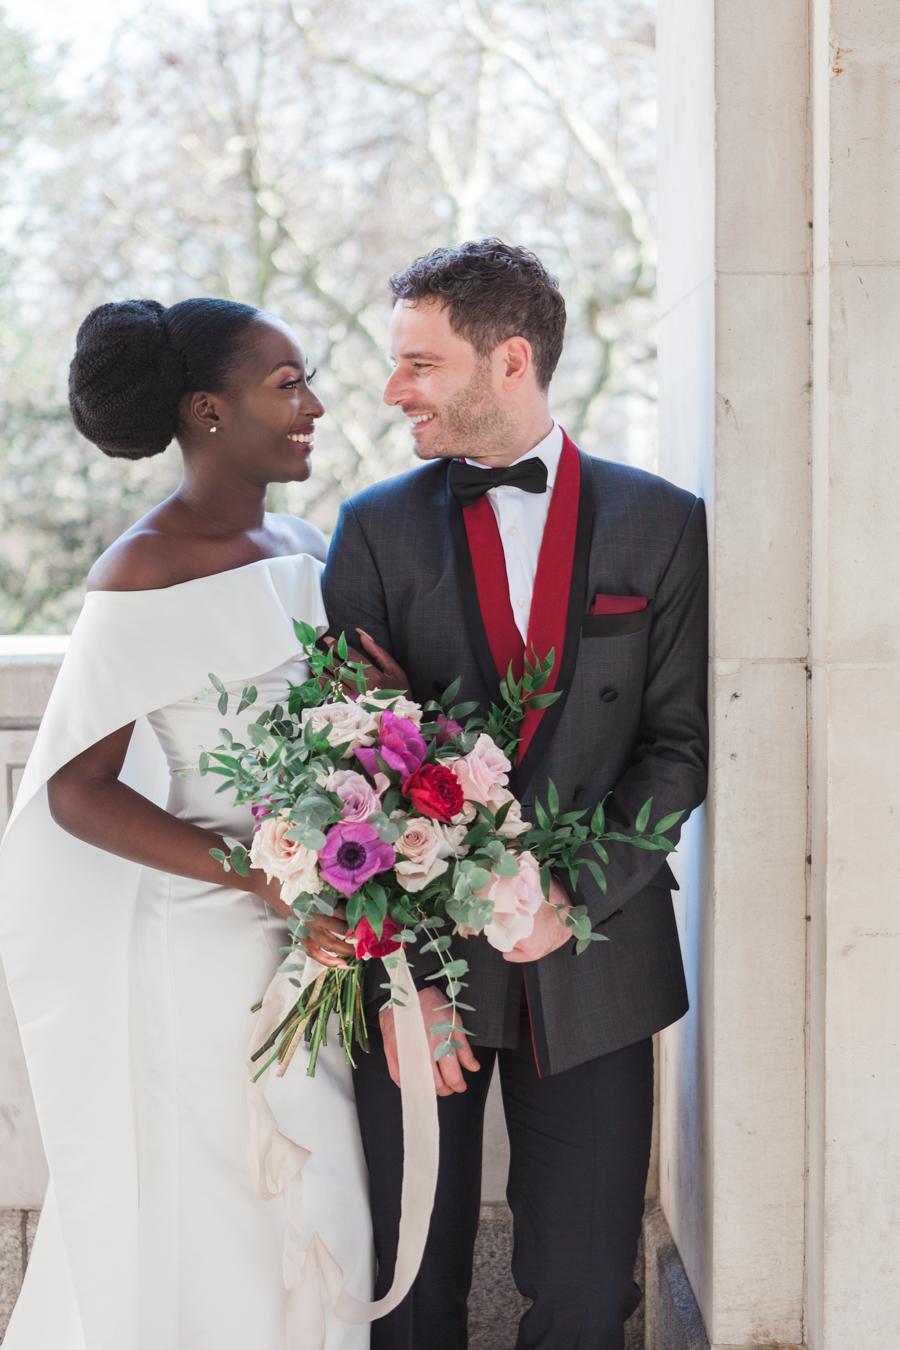 Breathtakingly beautiful - diversity wins in this stunning RSA London wedding editorial! (7)